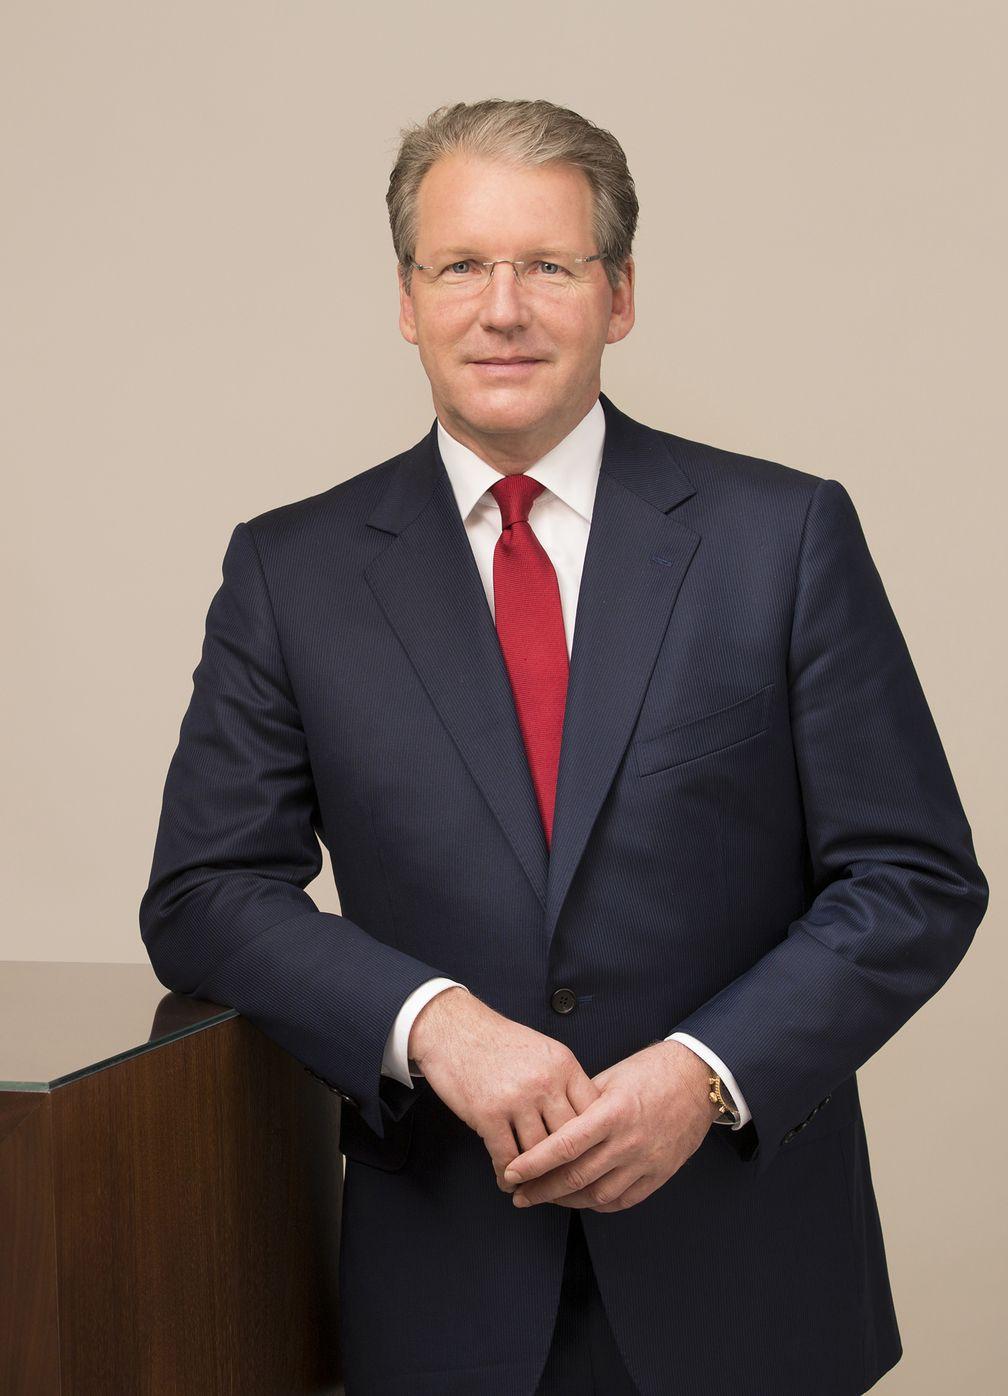 Jürgen M. Geißinger